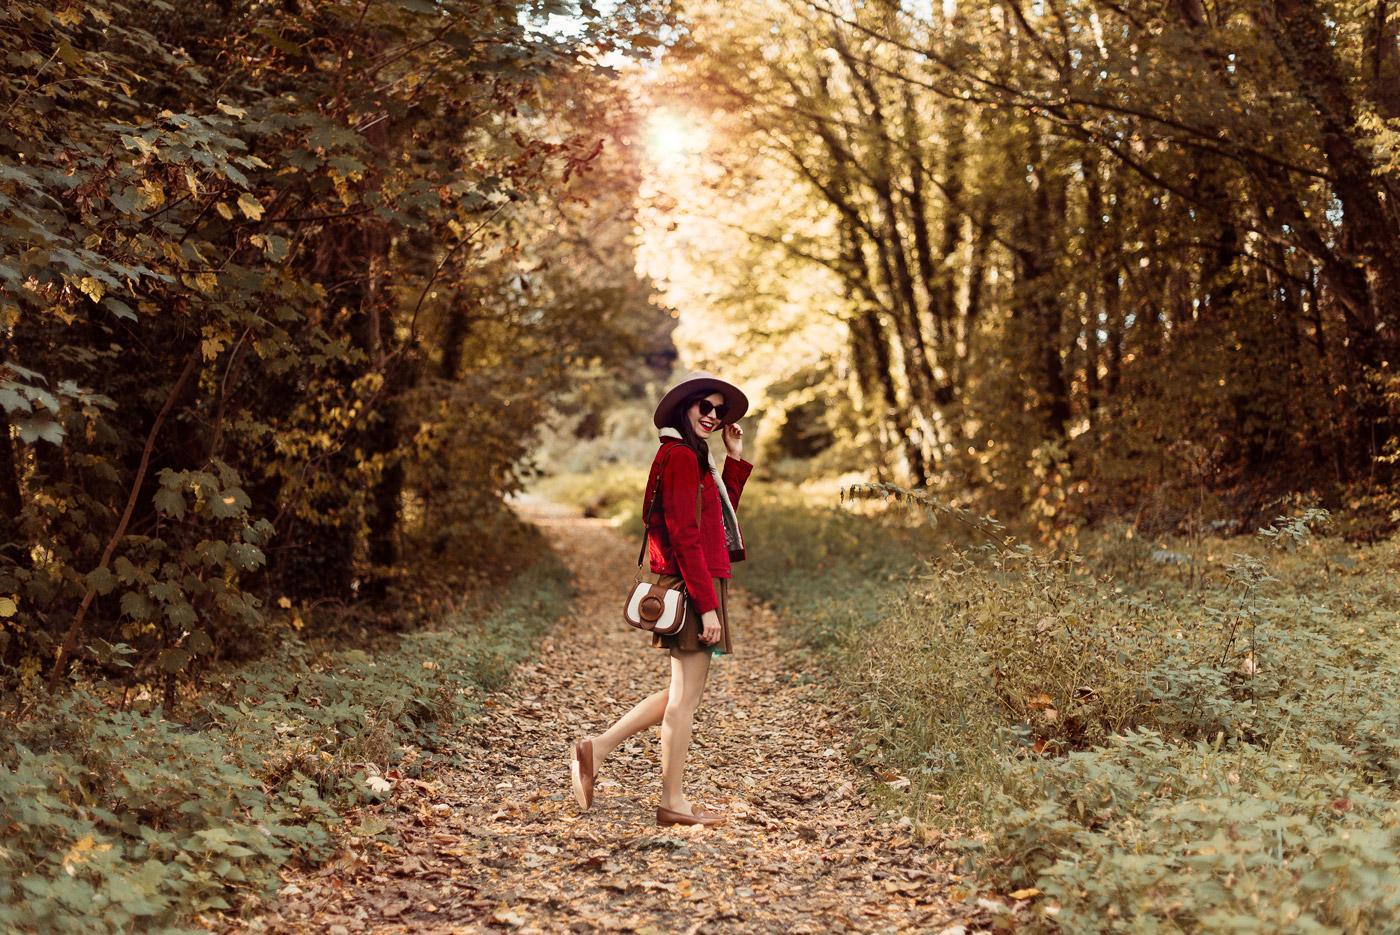 Shooting-foret-automne-veste-sherpa-levis_5398-2